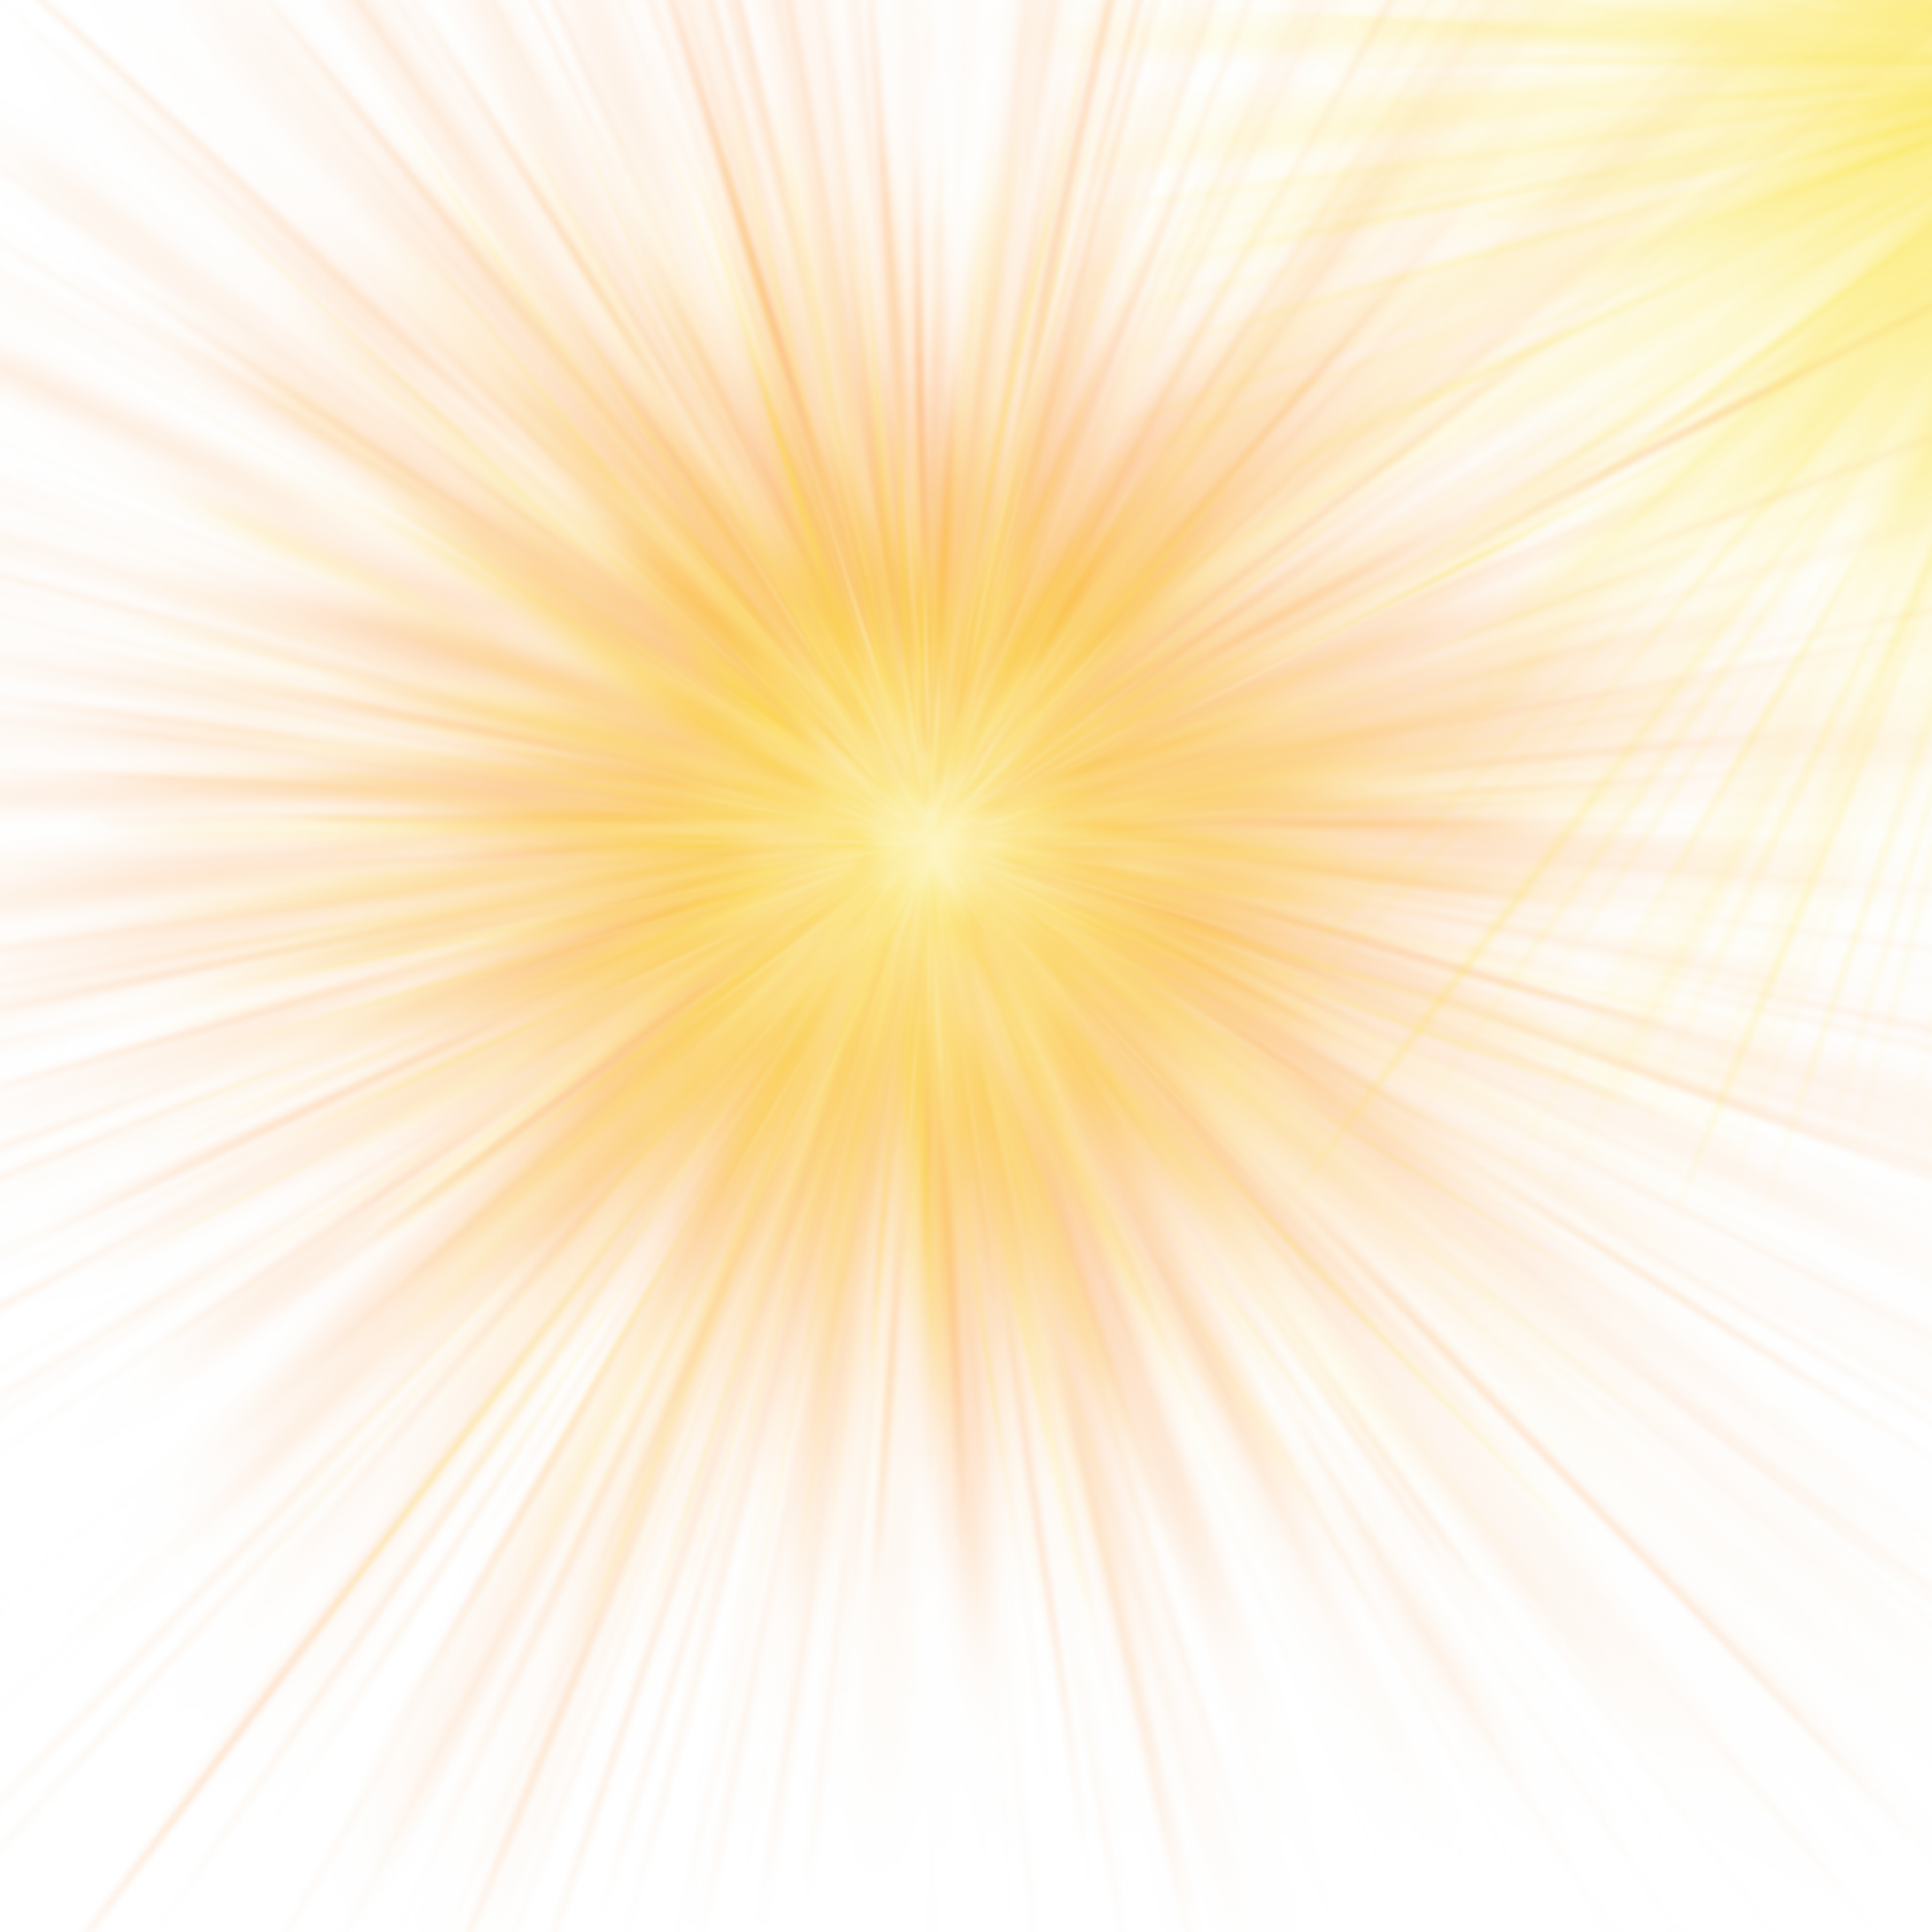 Free photo: Yellow light effect - Blur, Blurry, Effect ...